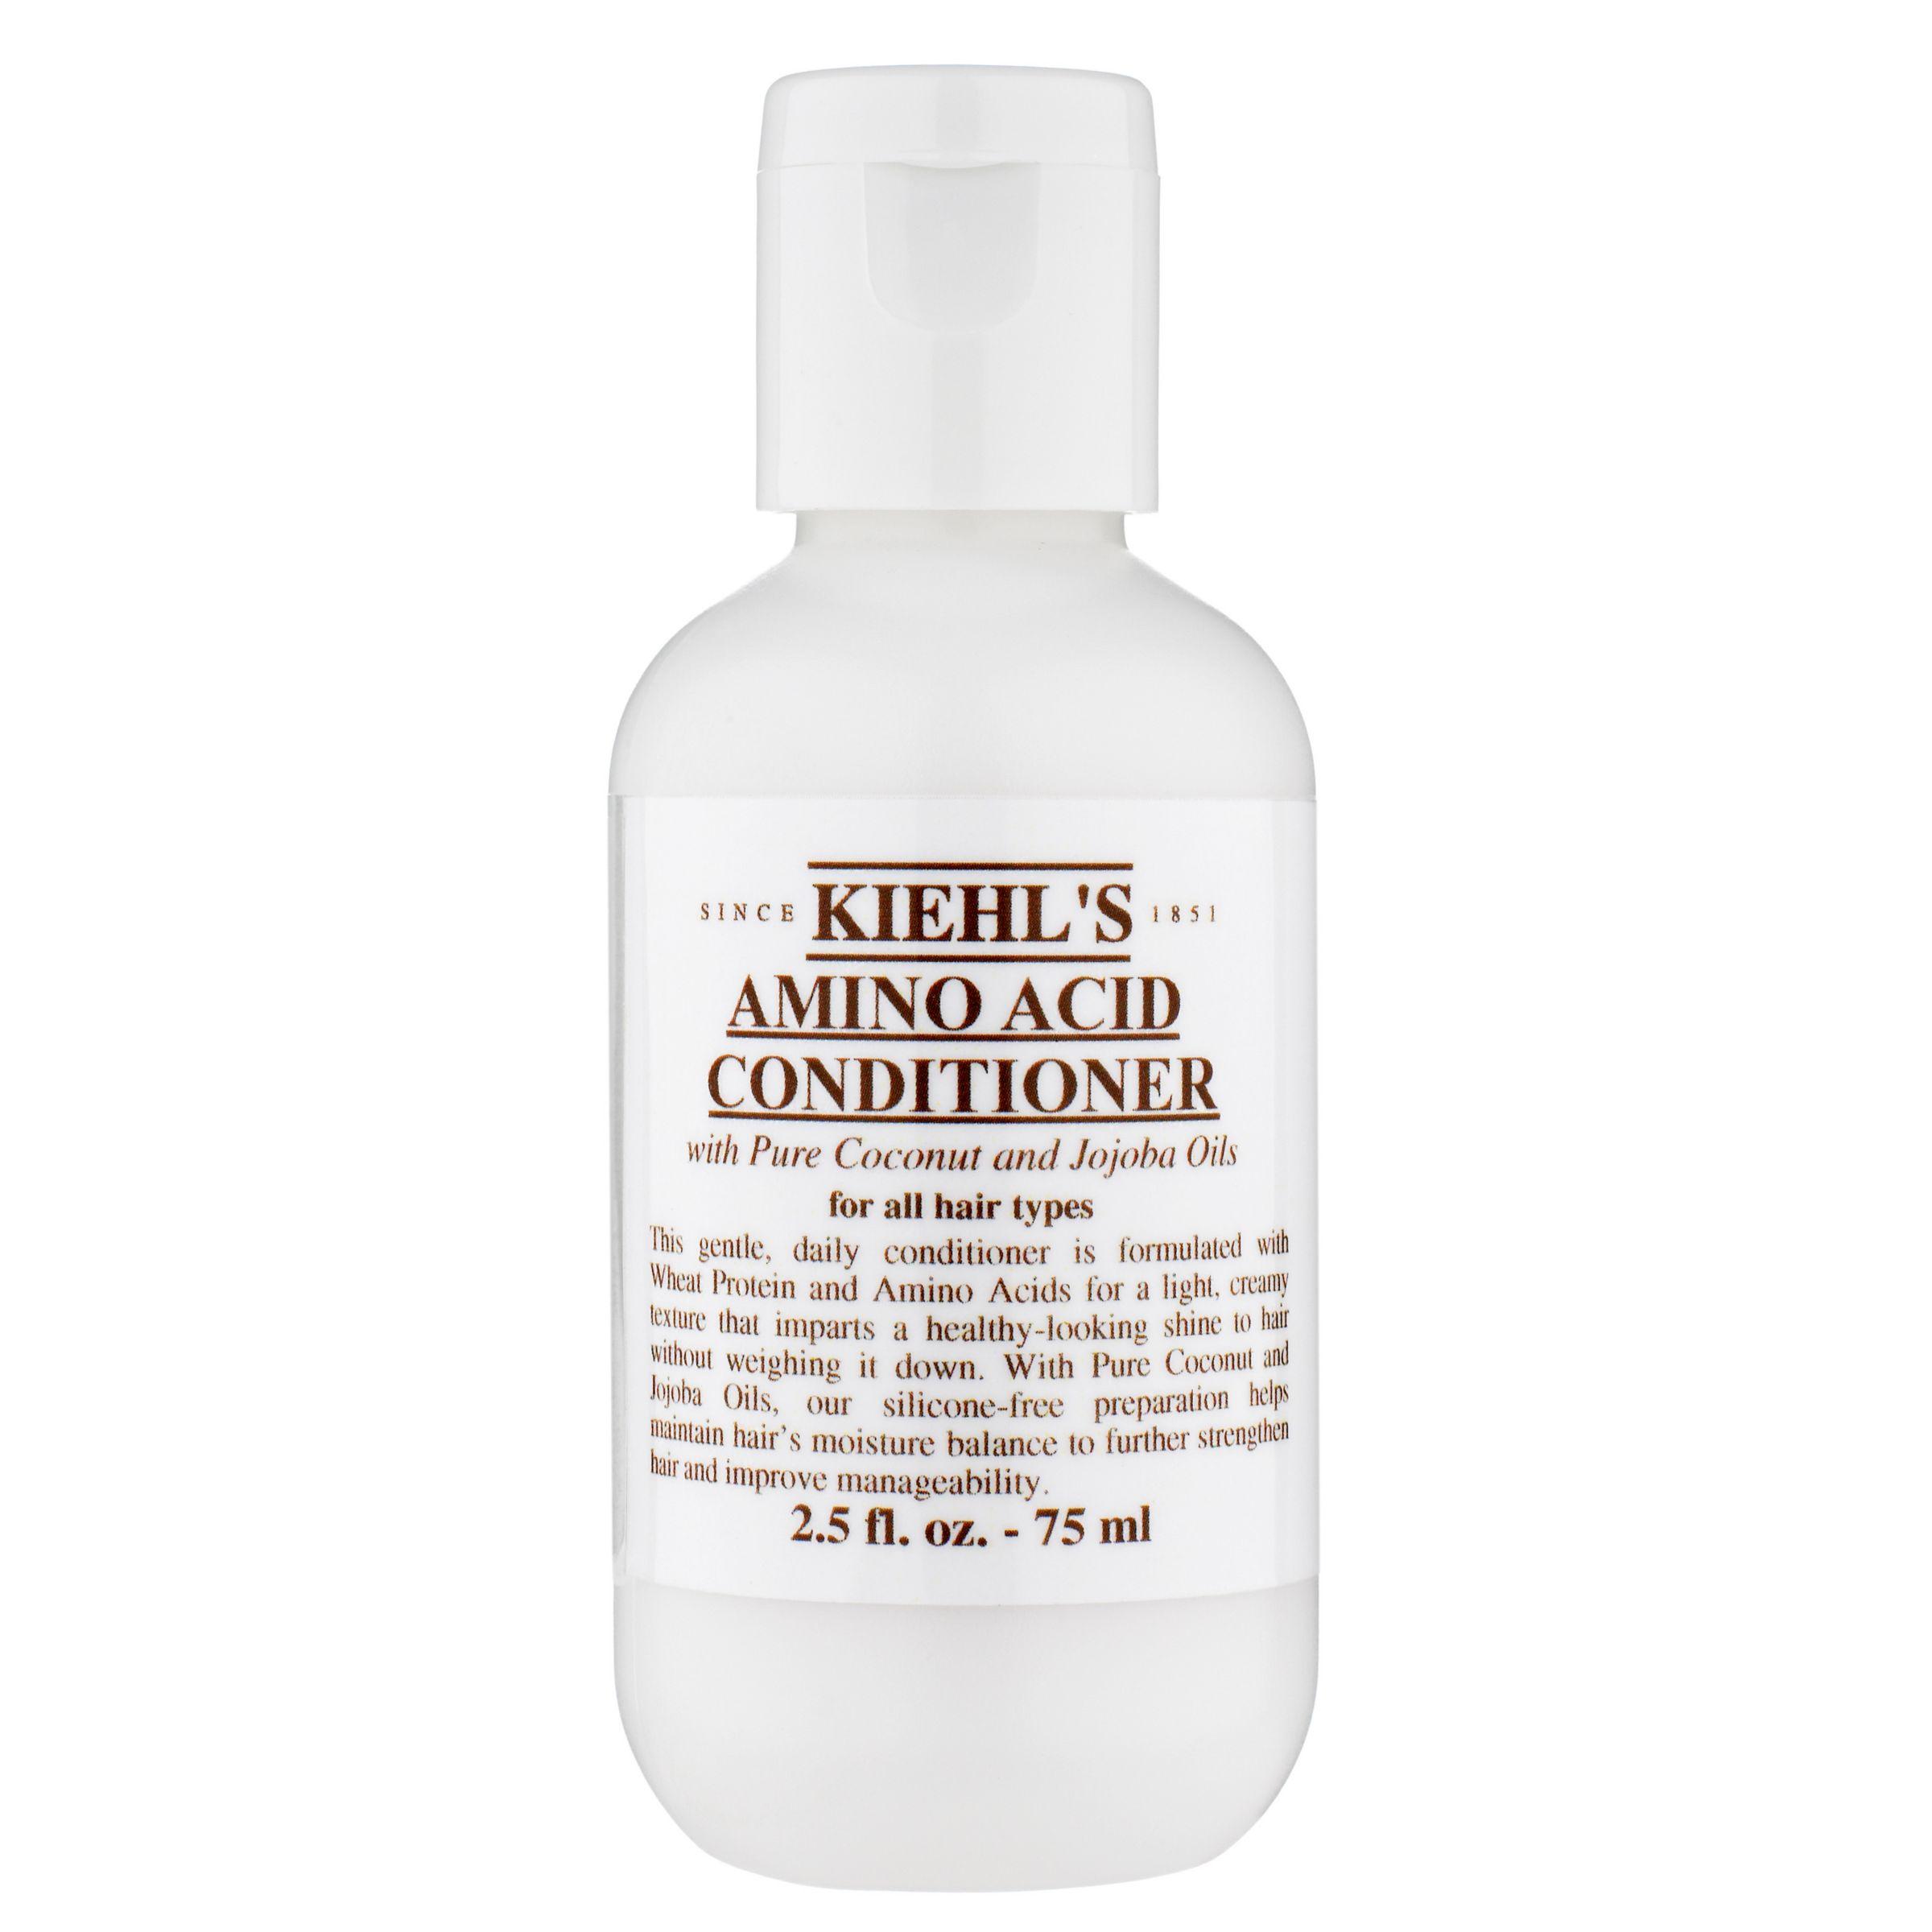 Kiehls Kiehl's Amino Acid Conditioner, 75ml